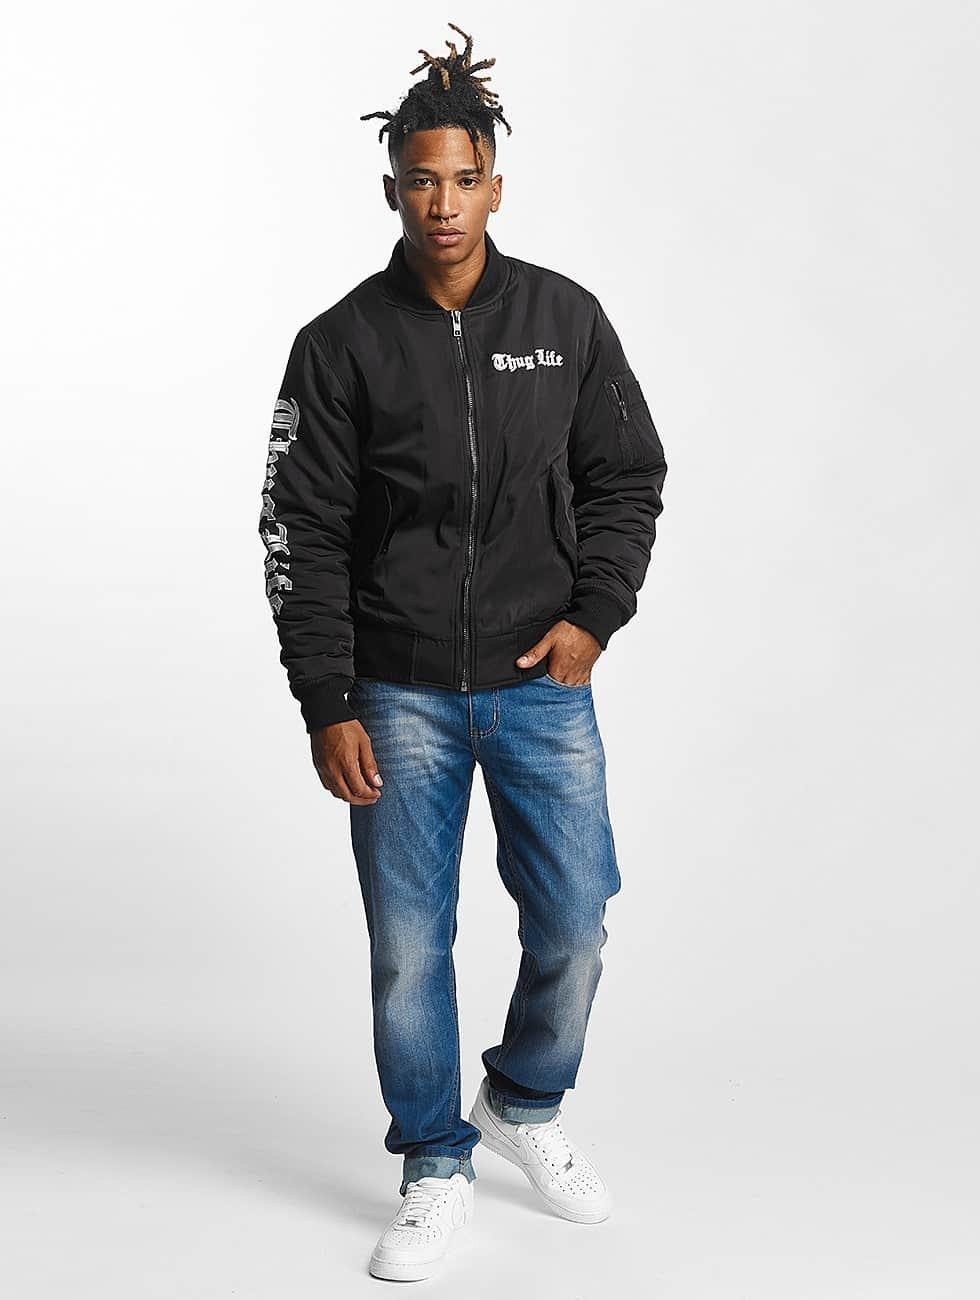 Thug Life Bomber jacket 2 in 1 black